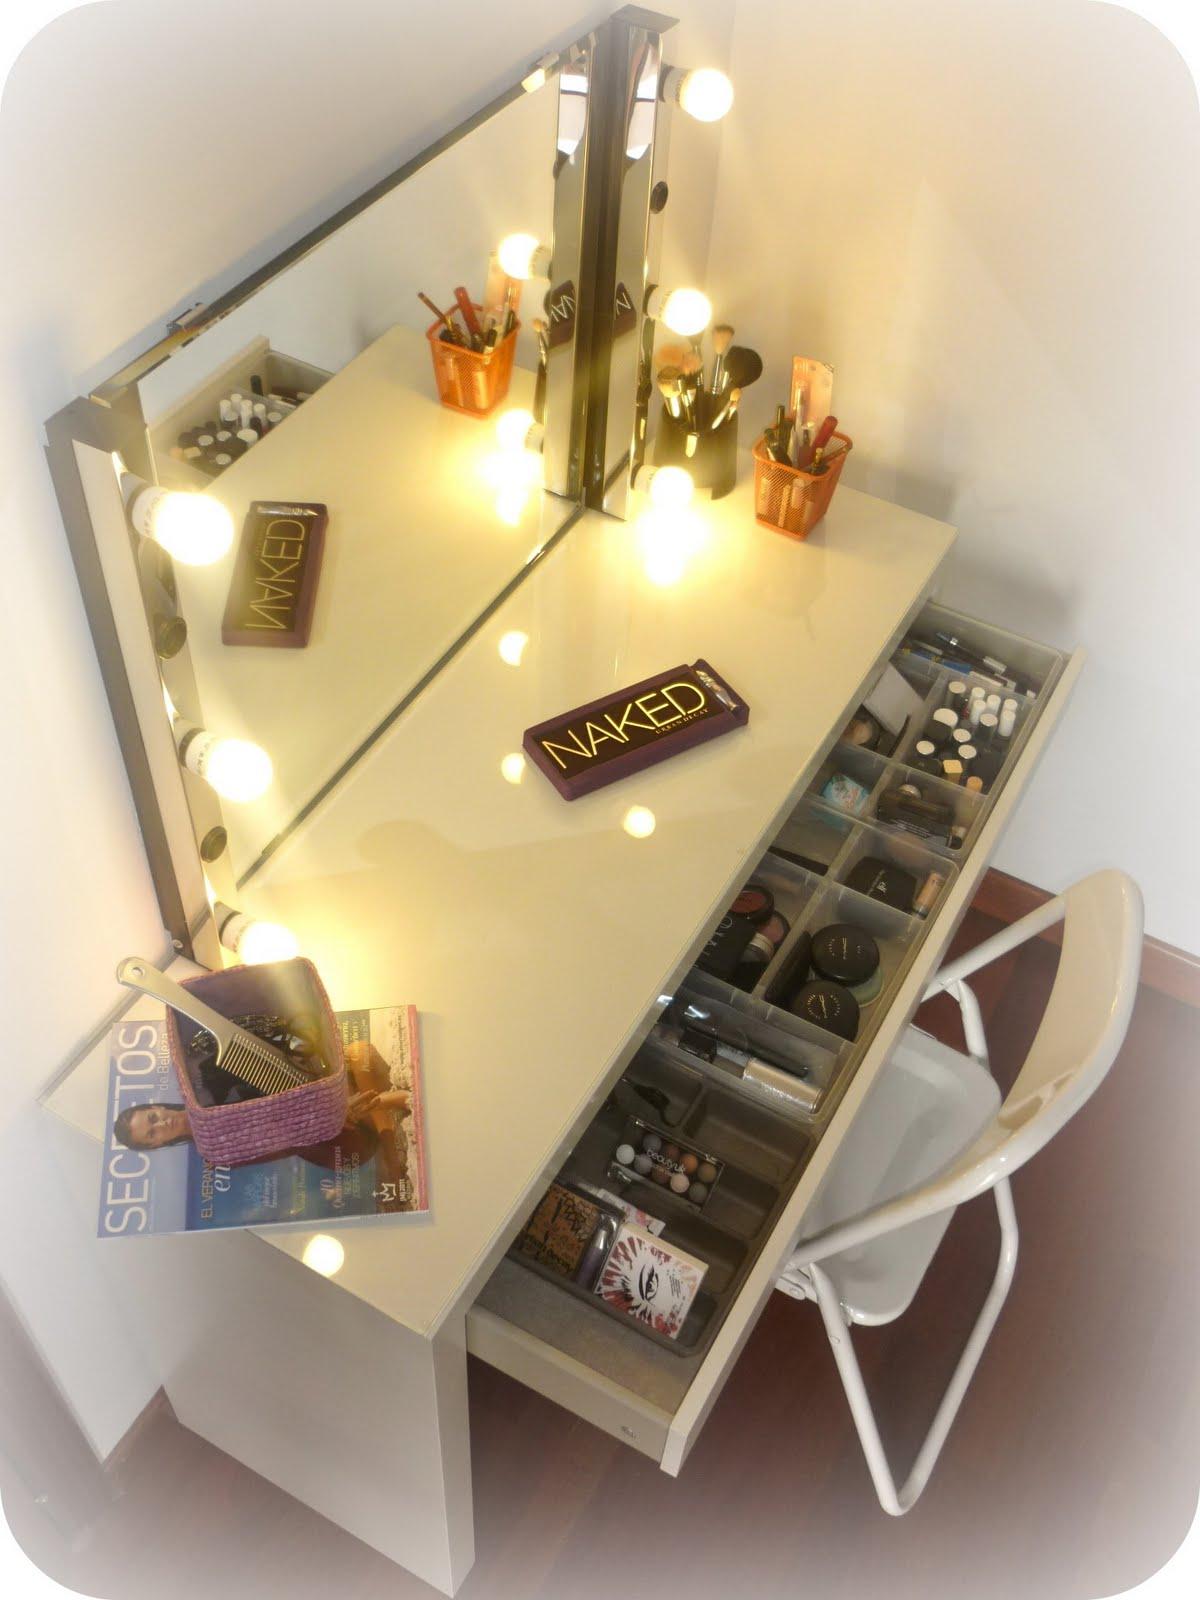 La joya de la corona obeblog diario de belleza for Espejo tocador ikea